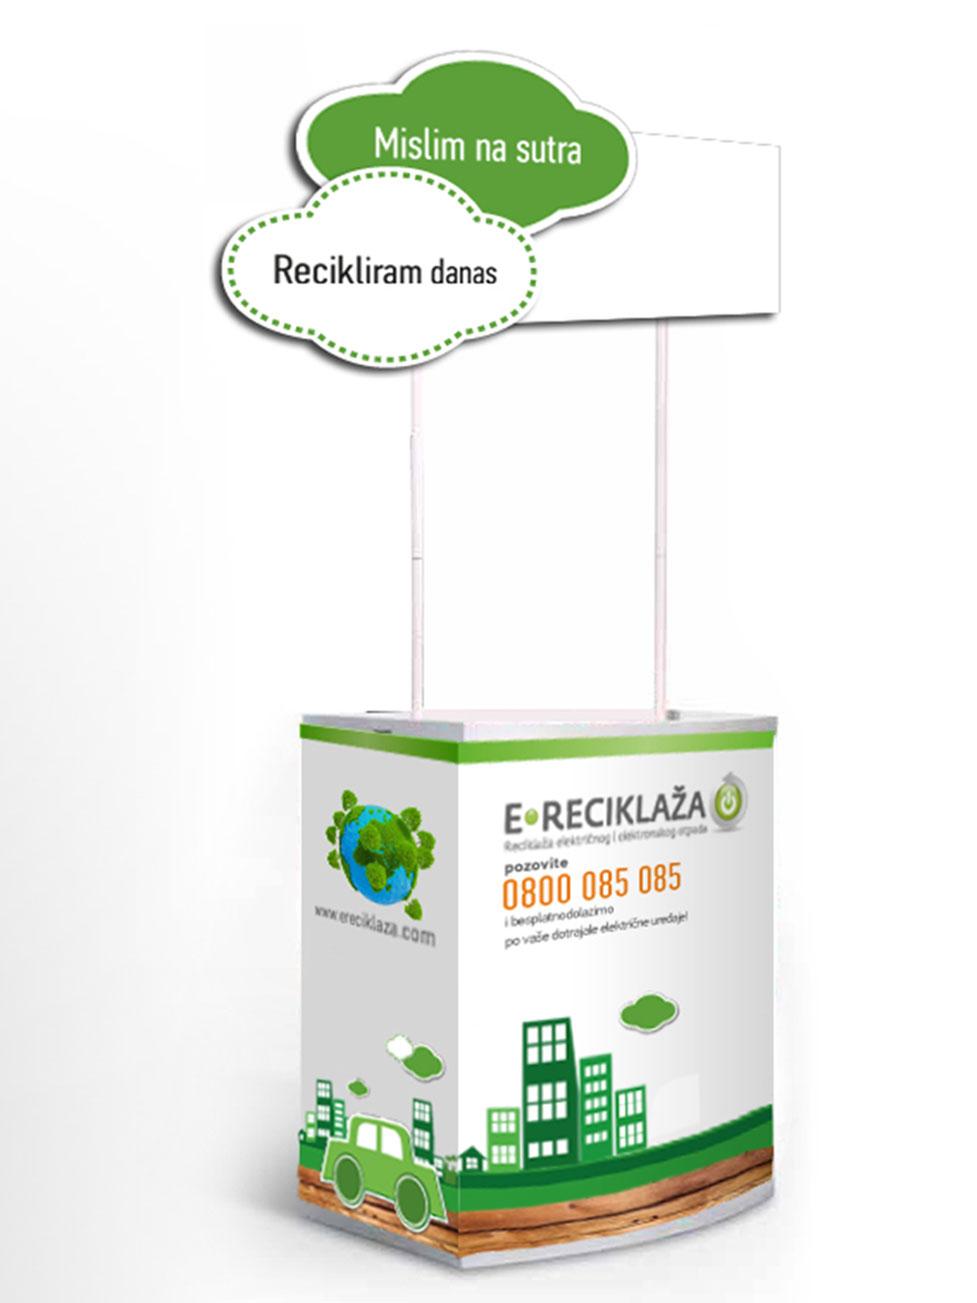 e-reciklaza promo materijal 1